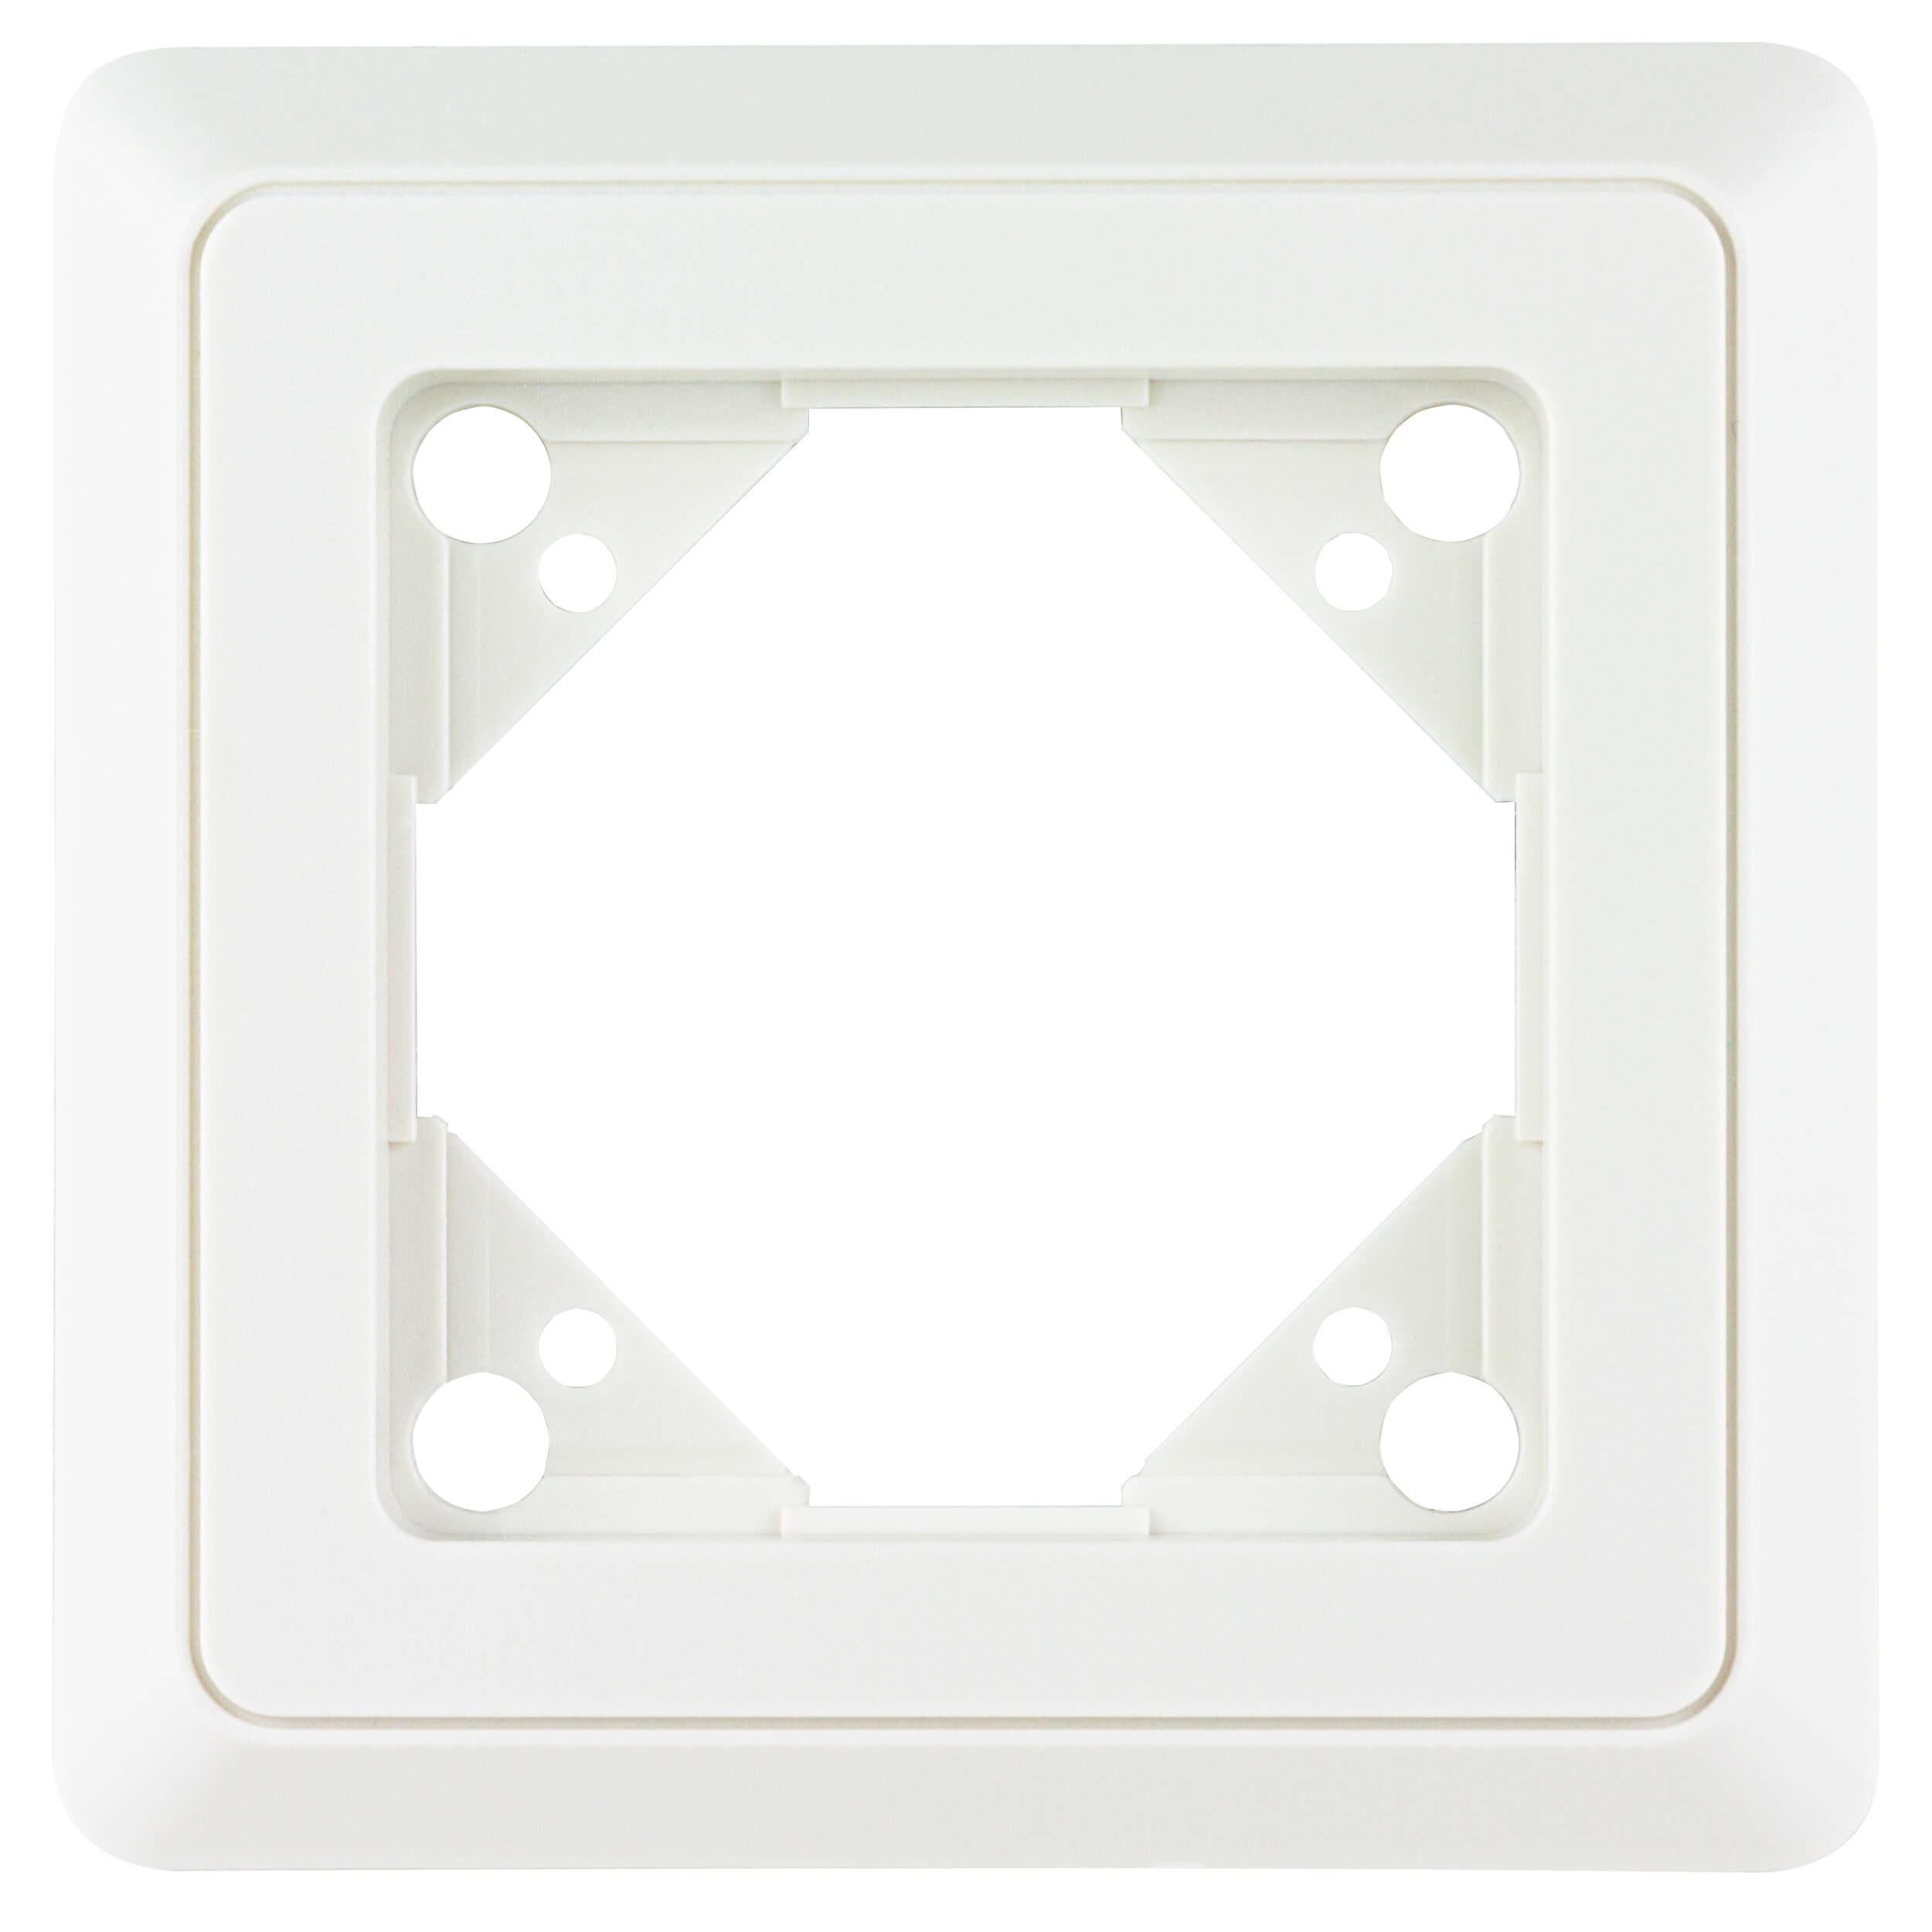 PrimaLuxe 1-fach Rahmen weiss